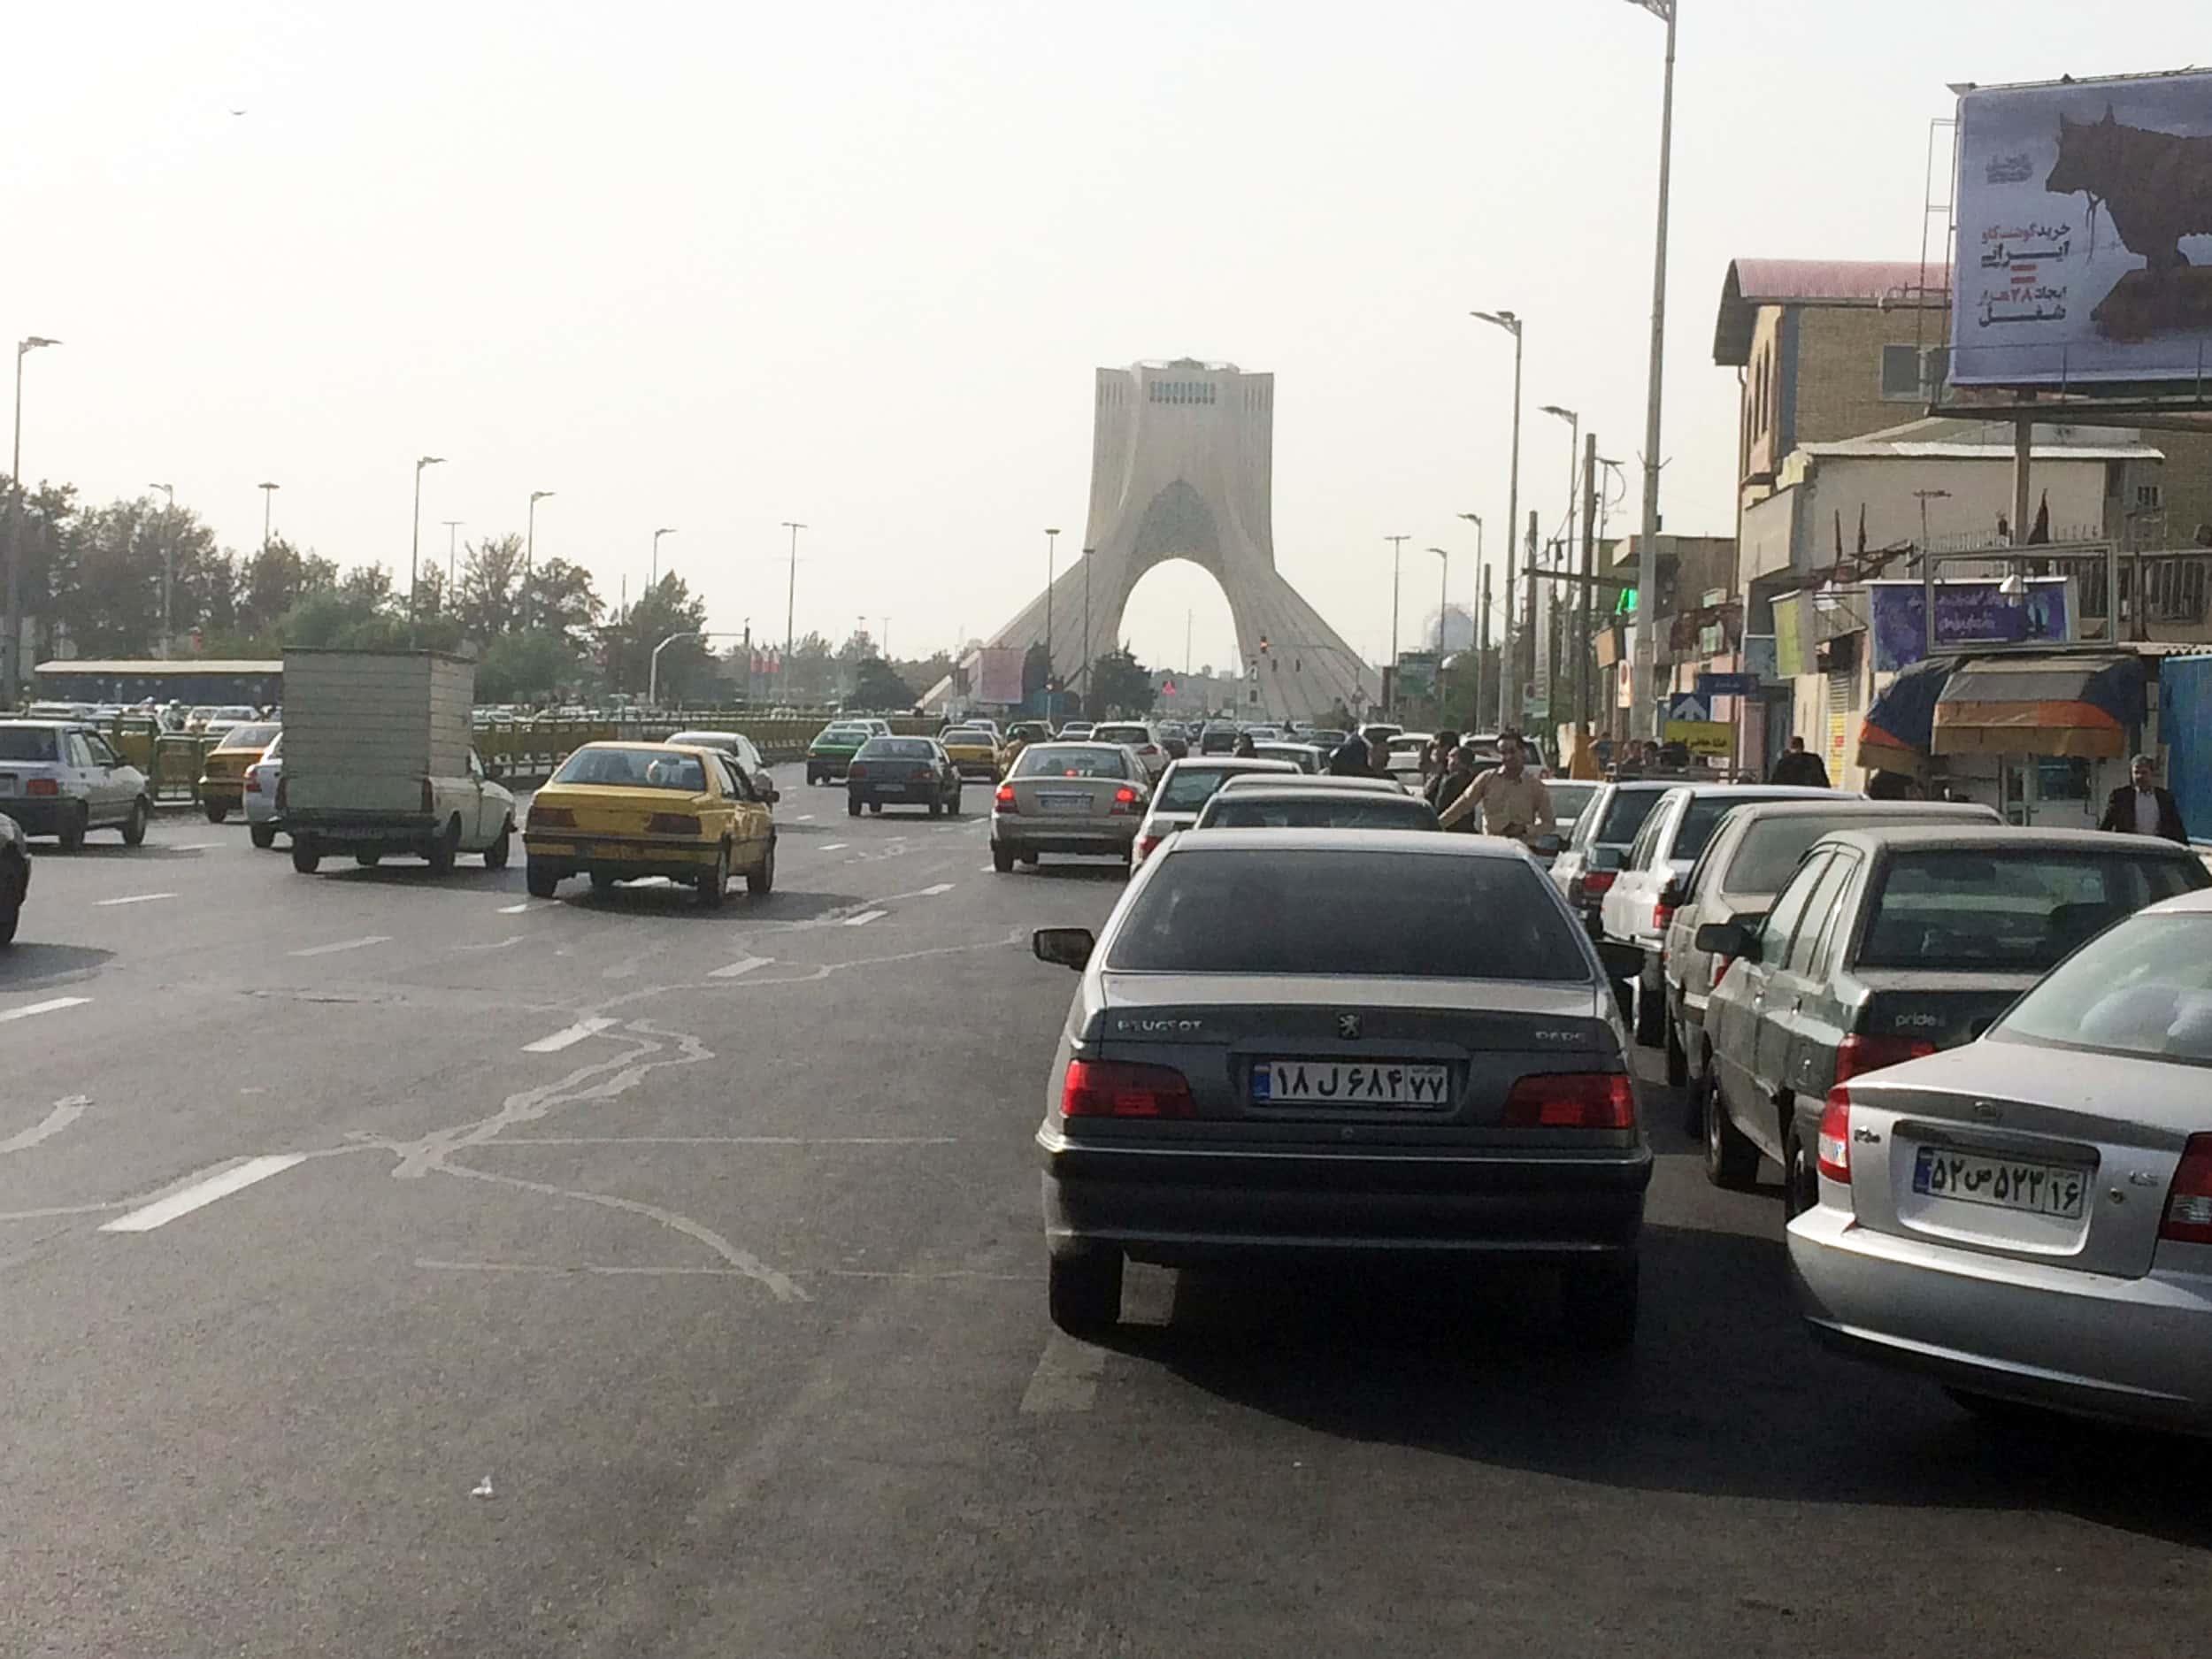 Іран. Азаді тауер. Фото 1